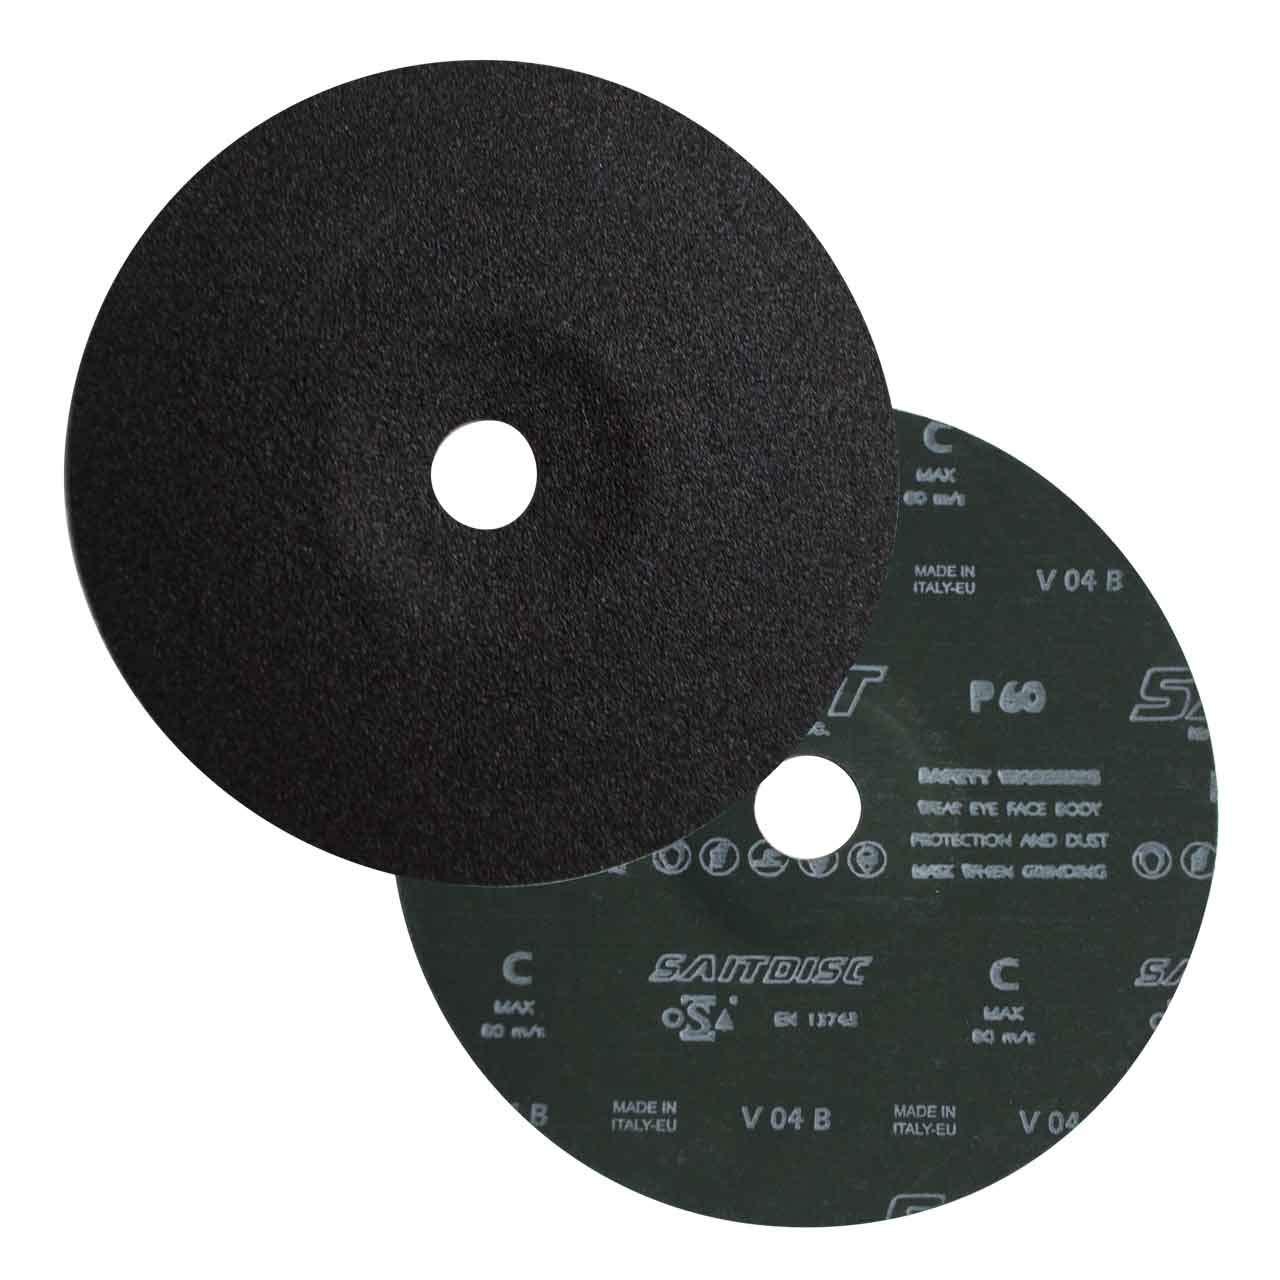 Sait 50104 7X7/8 Silicon Carbide Closed Coat Fiber Grinding Discs 60 G